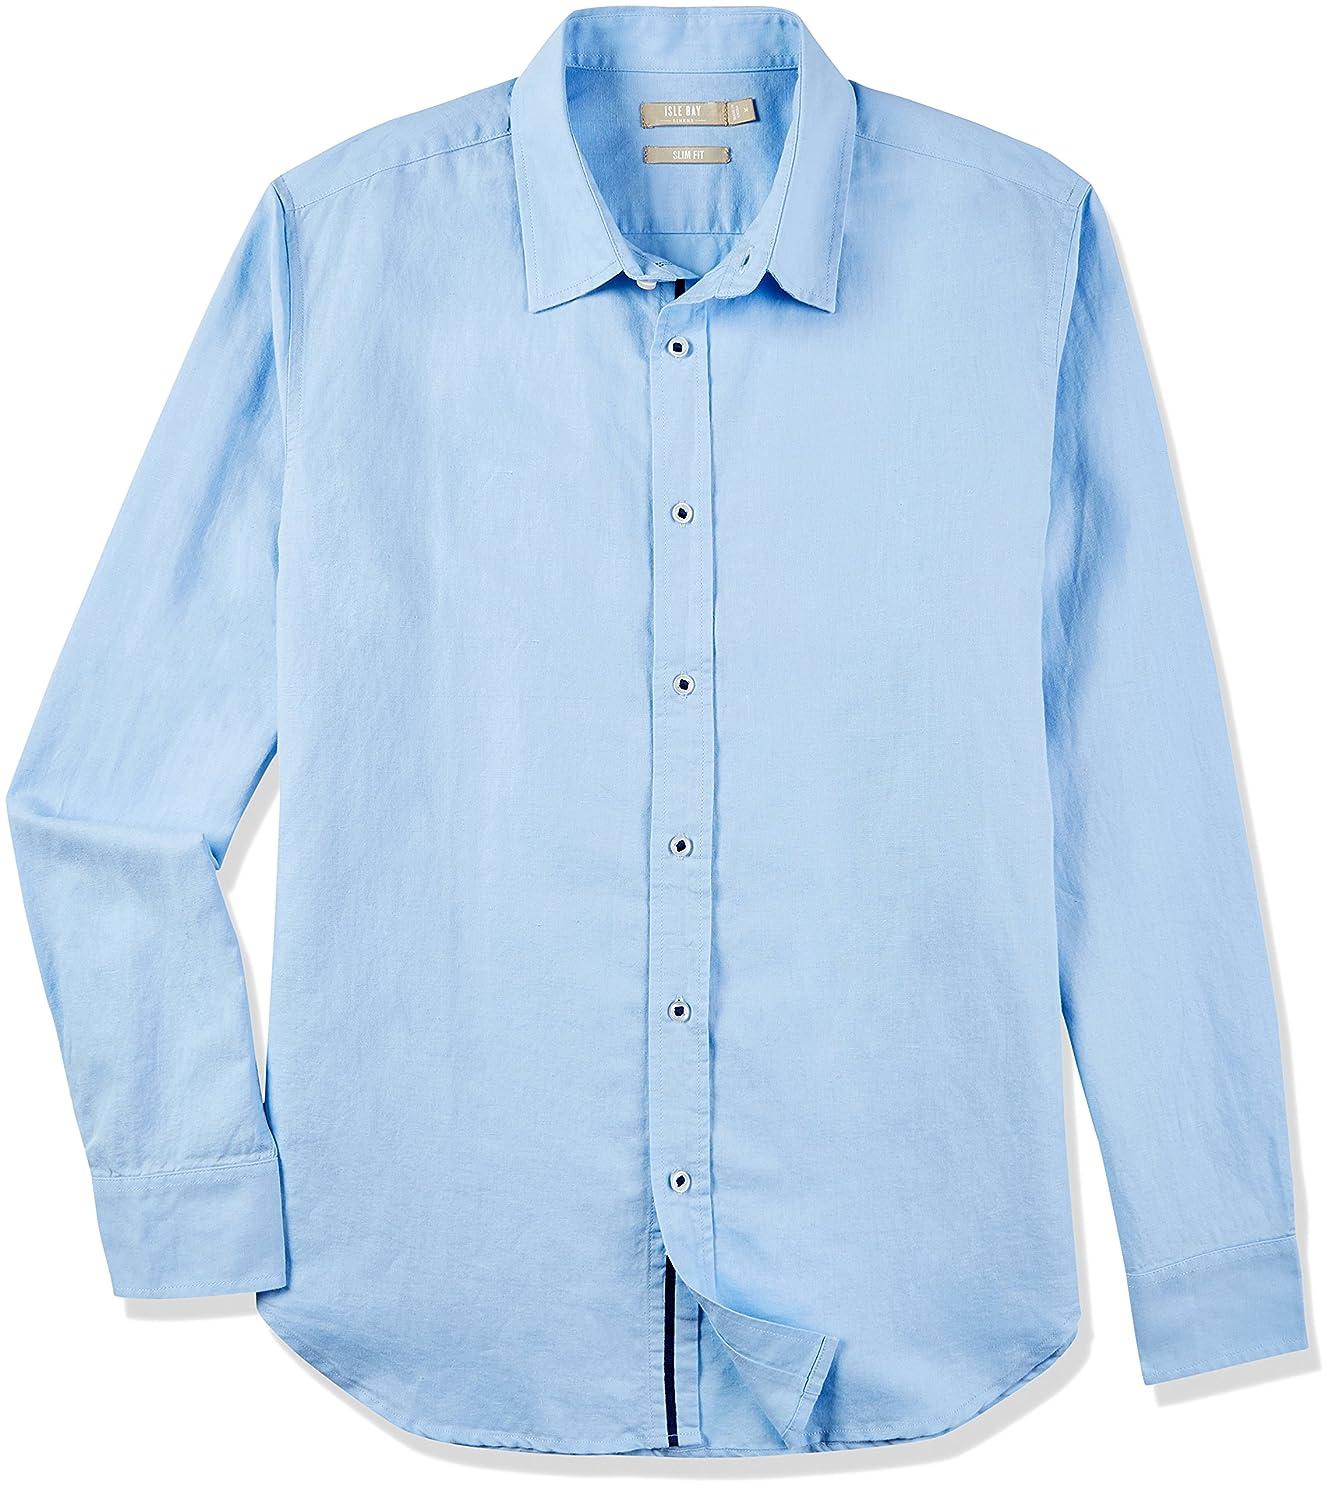 Isle Bay Linens Men's Linen Cotton Slim-Fit Long Sleeve Casual Shirt